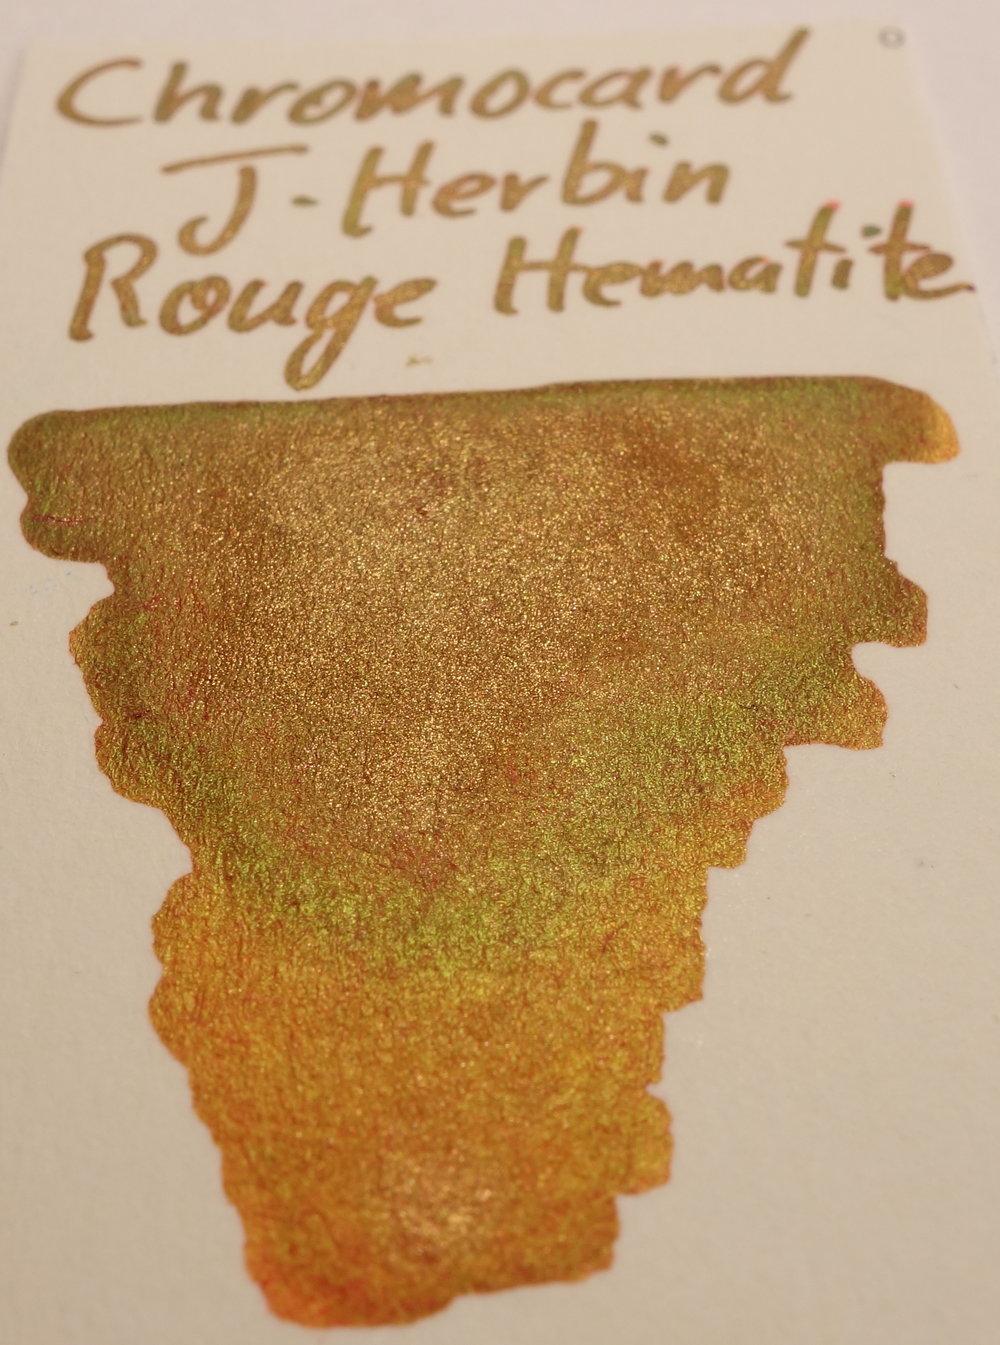 J. Herbin Rouge Hematite Sheen Chromocard 2.JPG